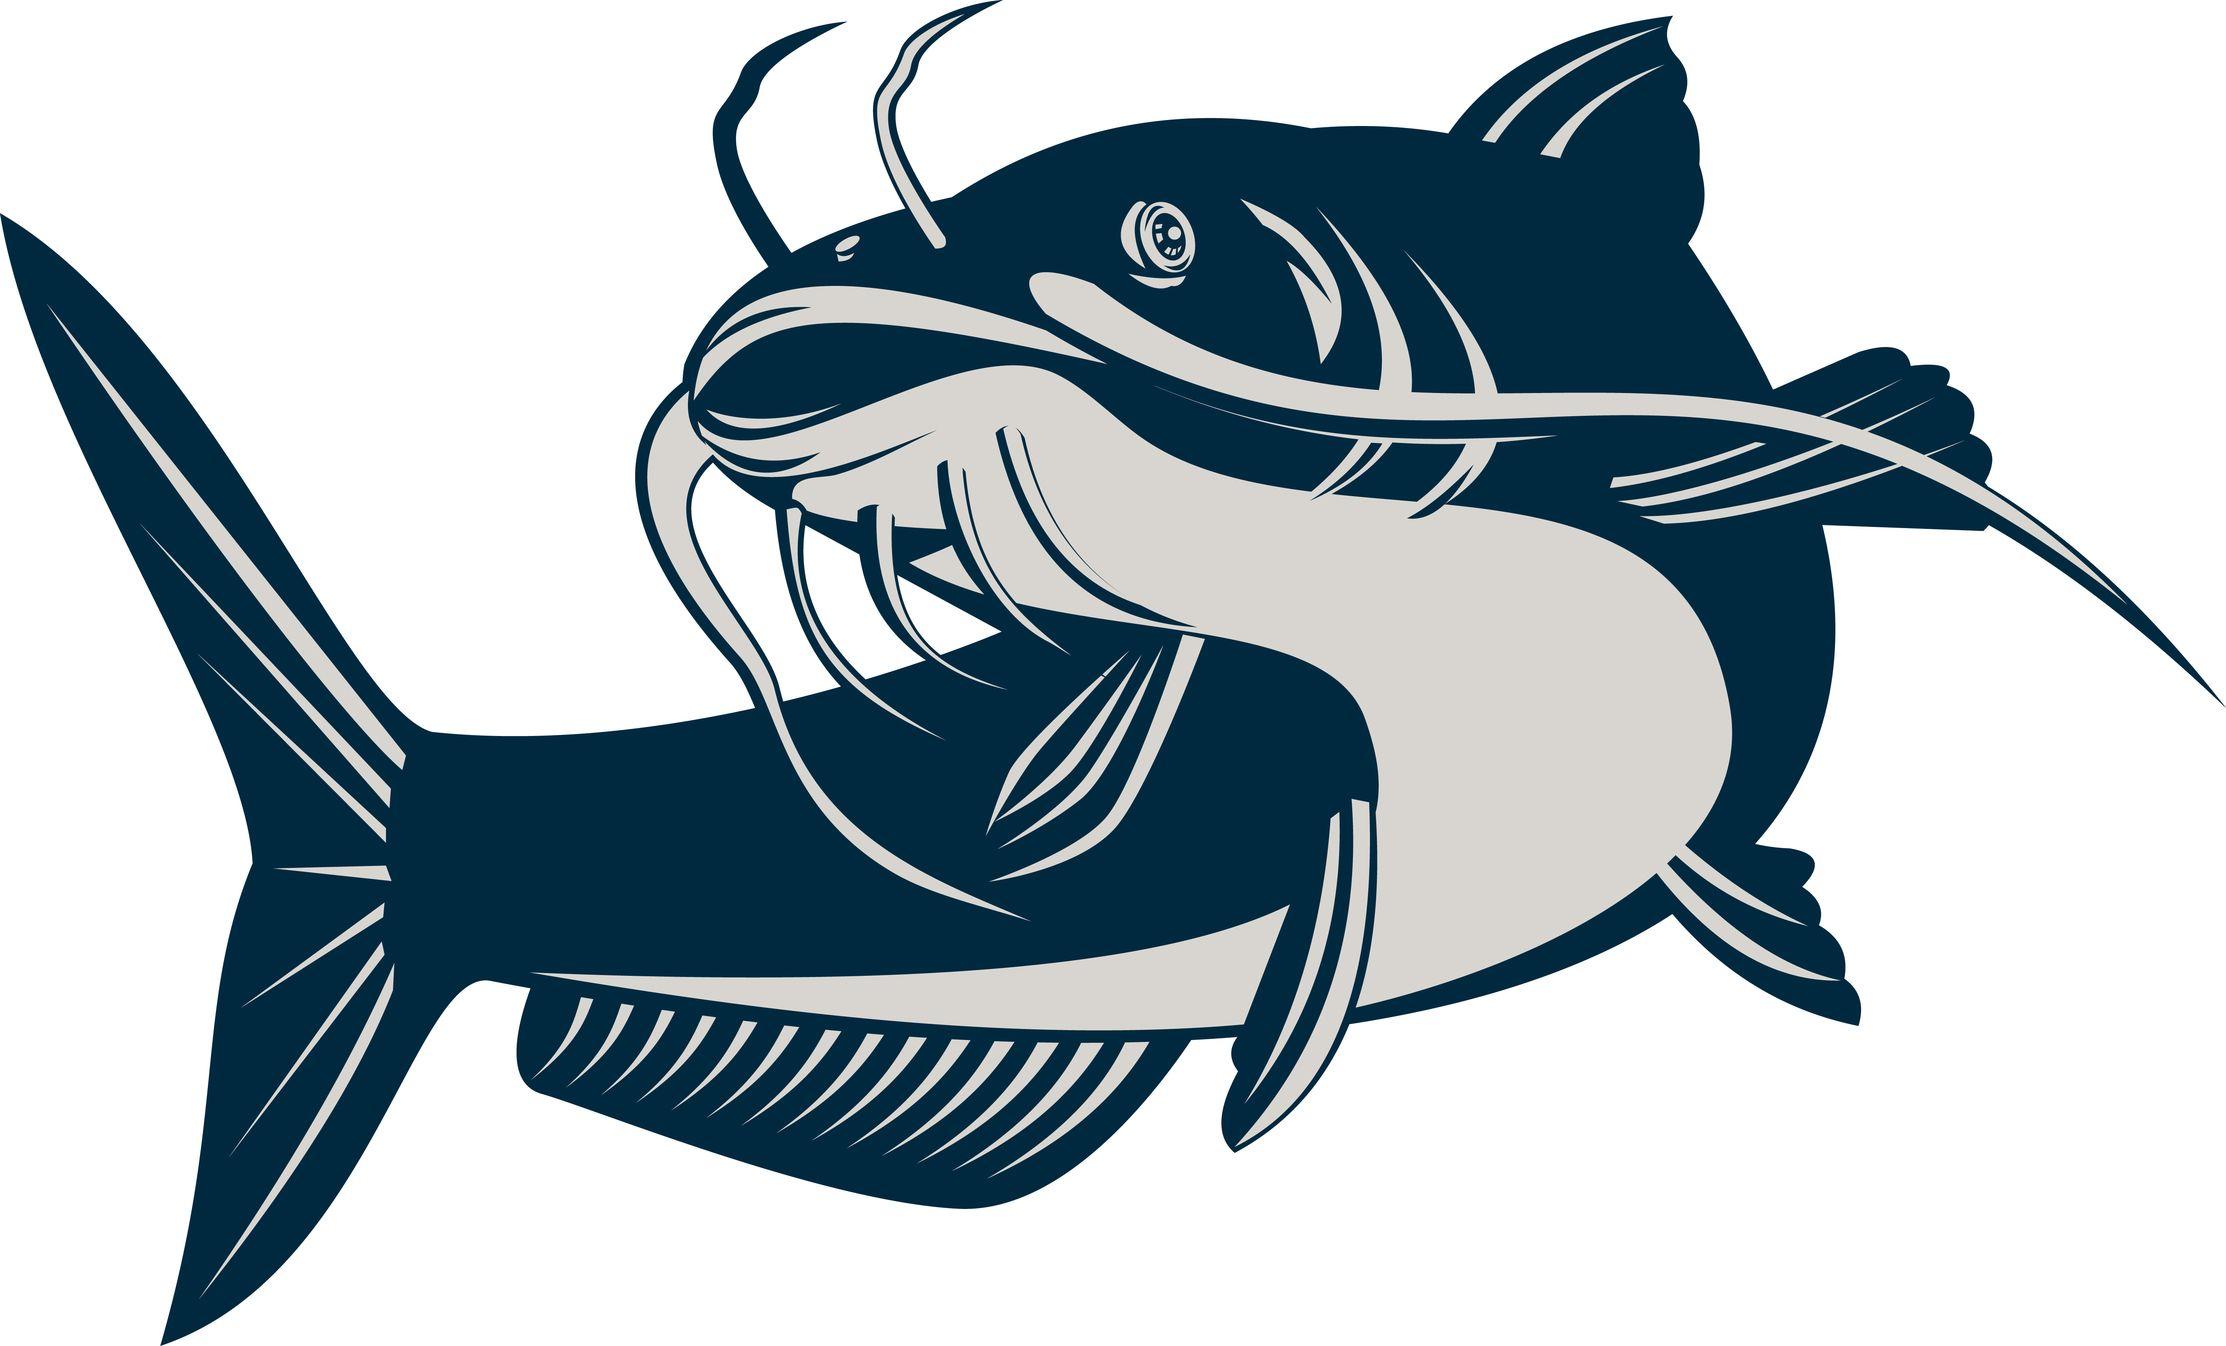 Catfish Tattoo Designs.